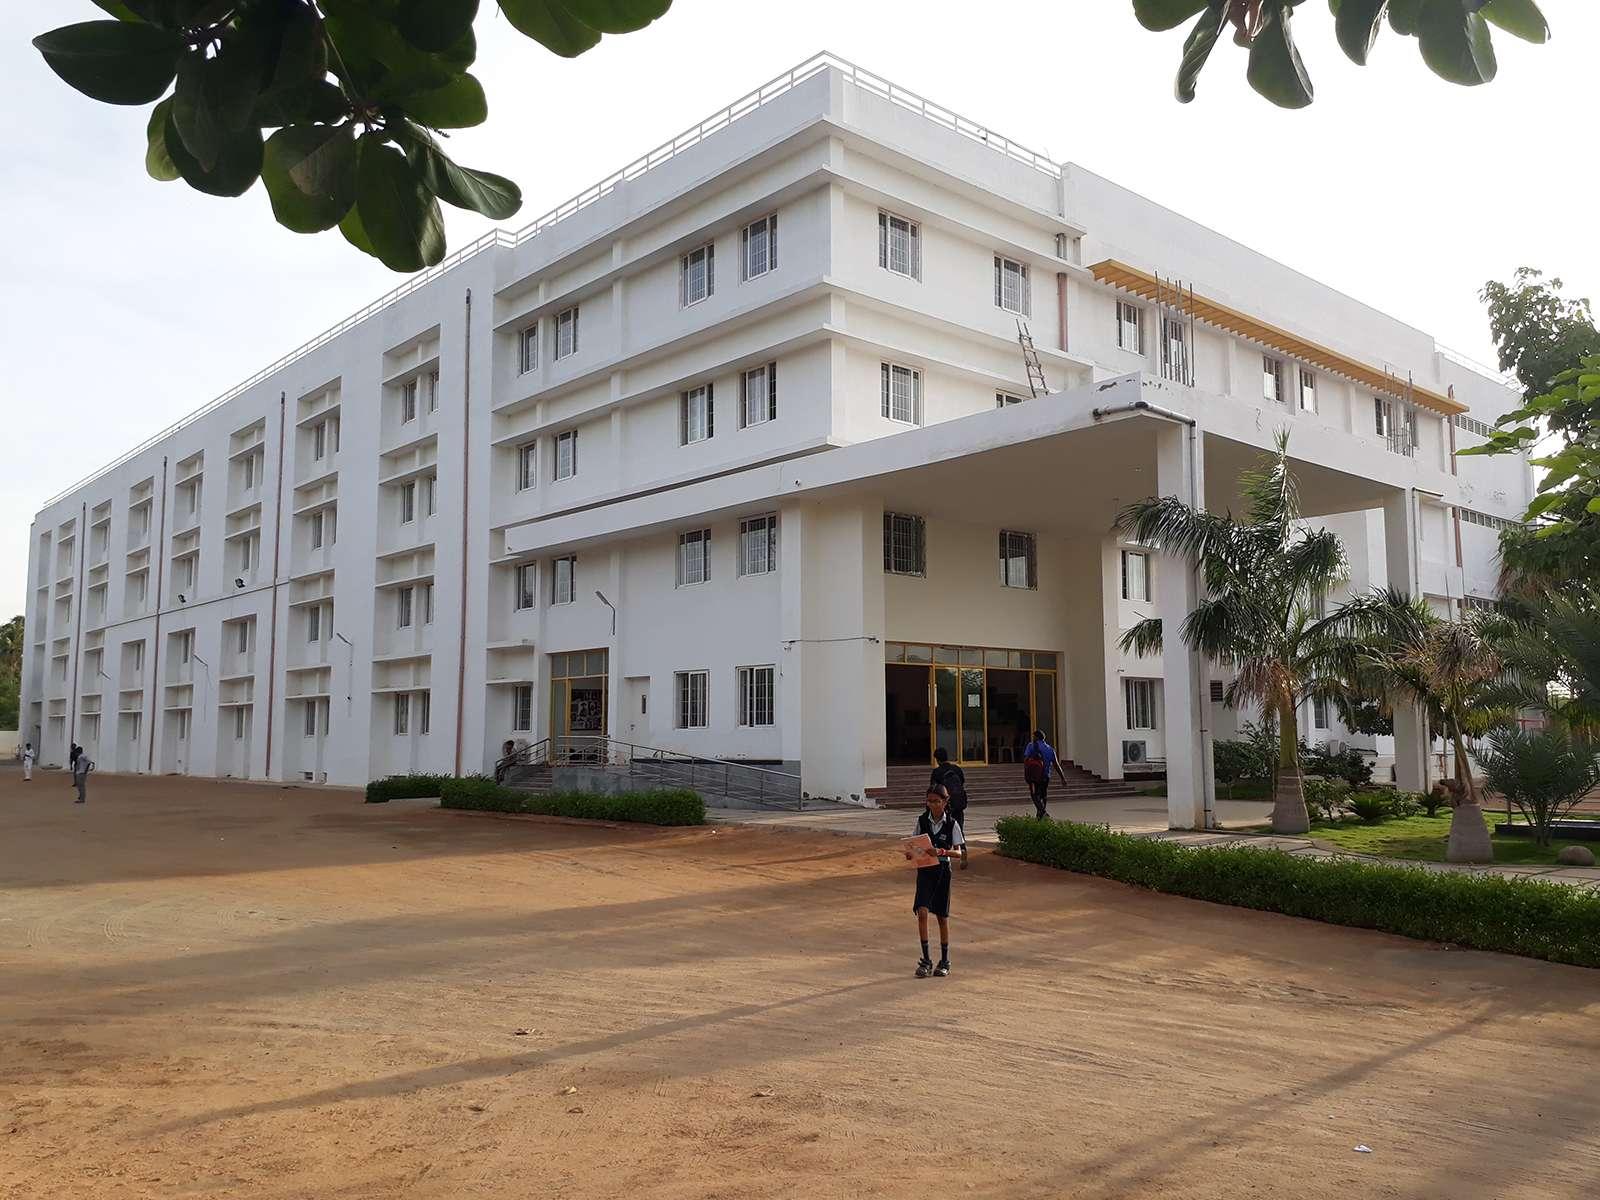 Sri Sankara Vidyalayaa S F No 2347 2348 amp 2349Andankovil East Village Chinnandan kovil 1930436